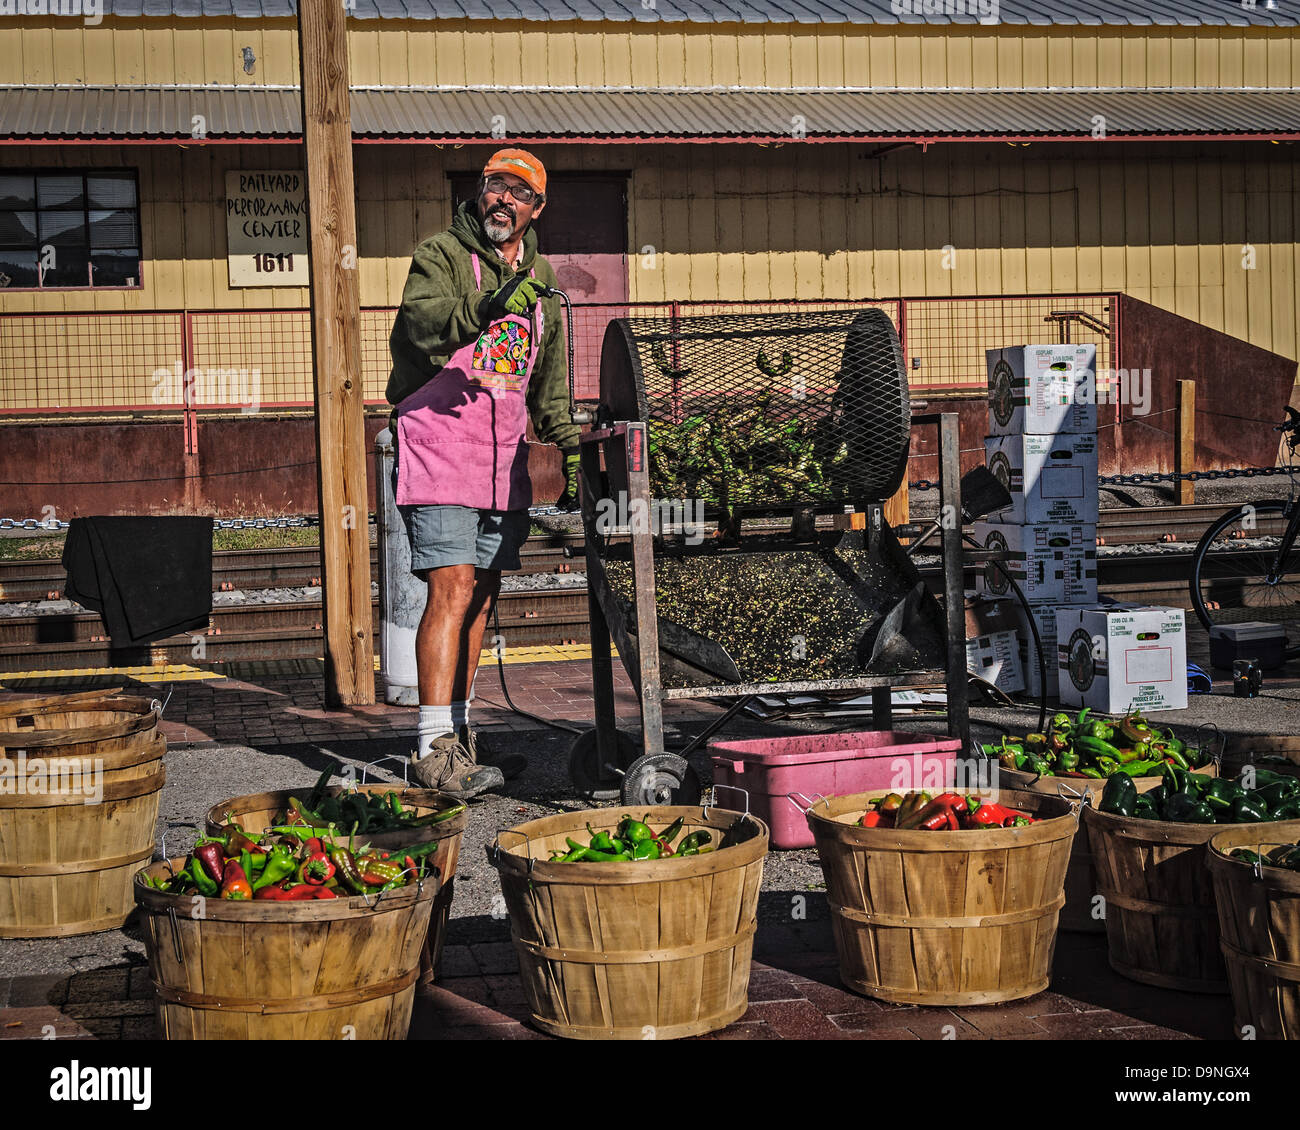 Chili Pepper Roasting, Santa Fe Farmers Market, The Railyard, Santa Fe, New Mexico - Stock Image